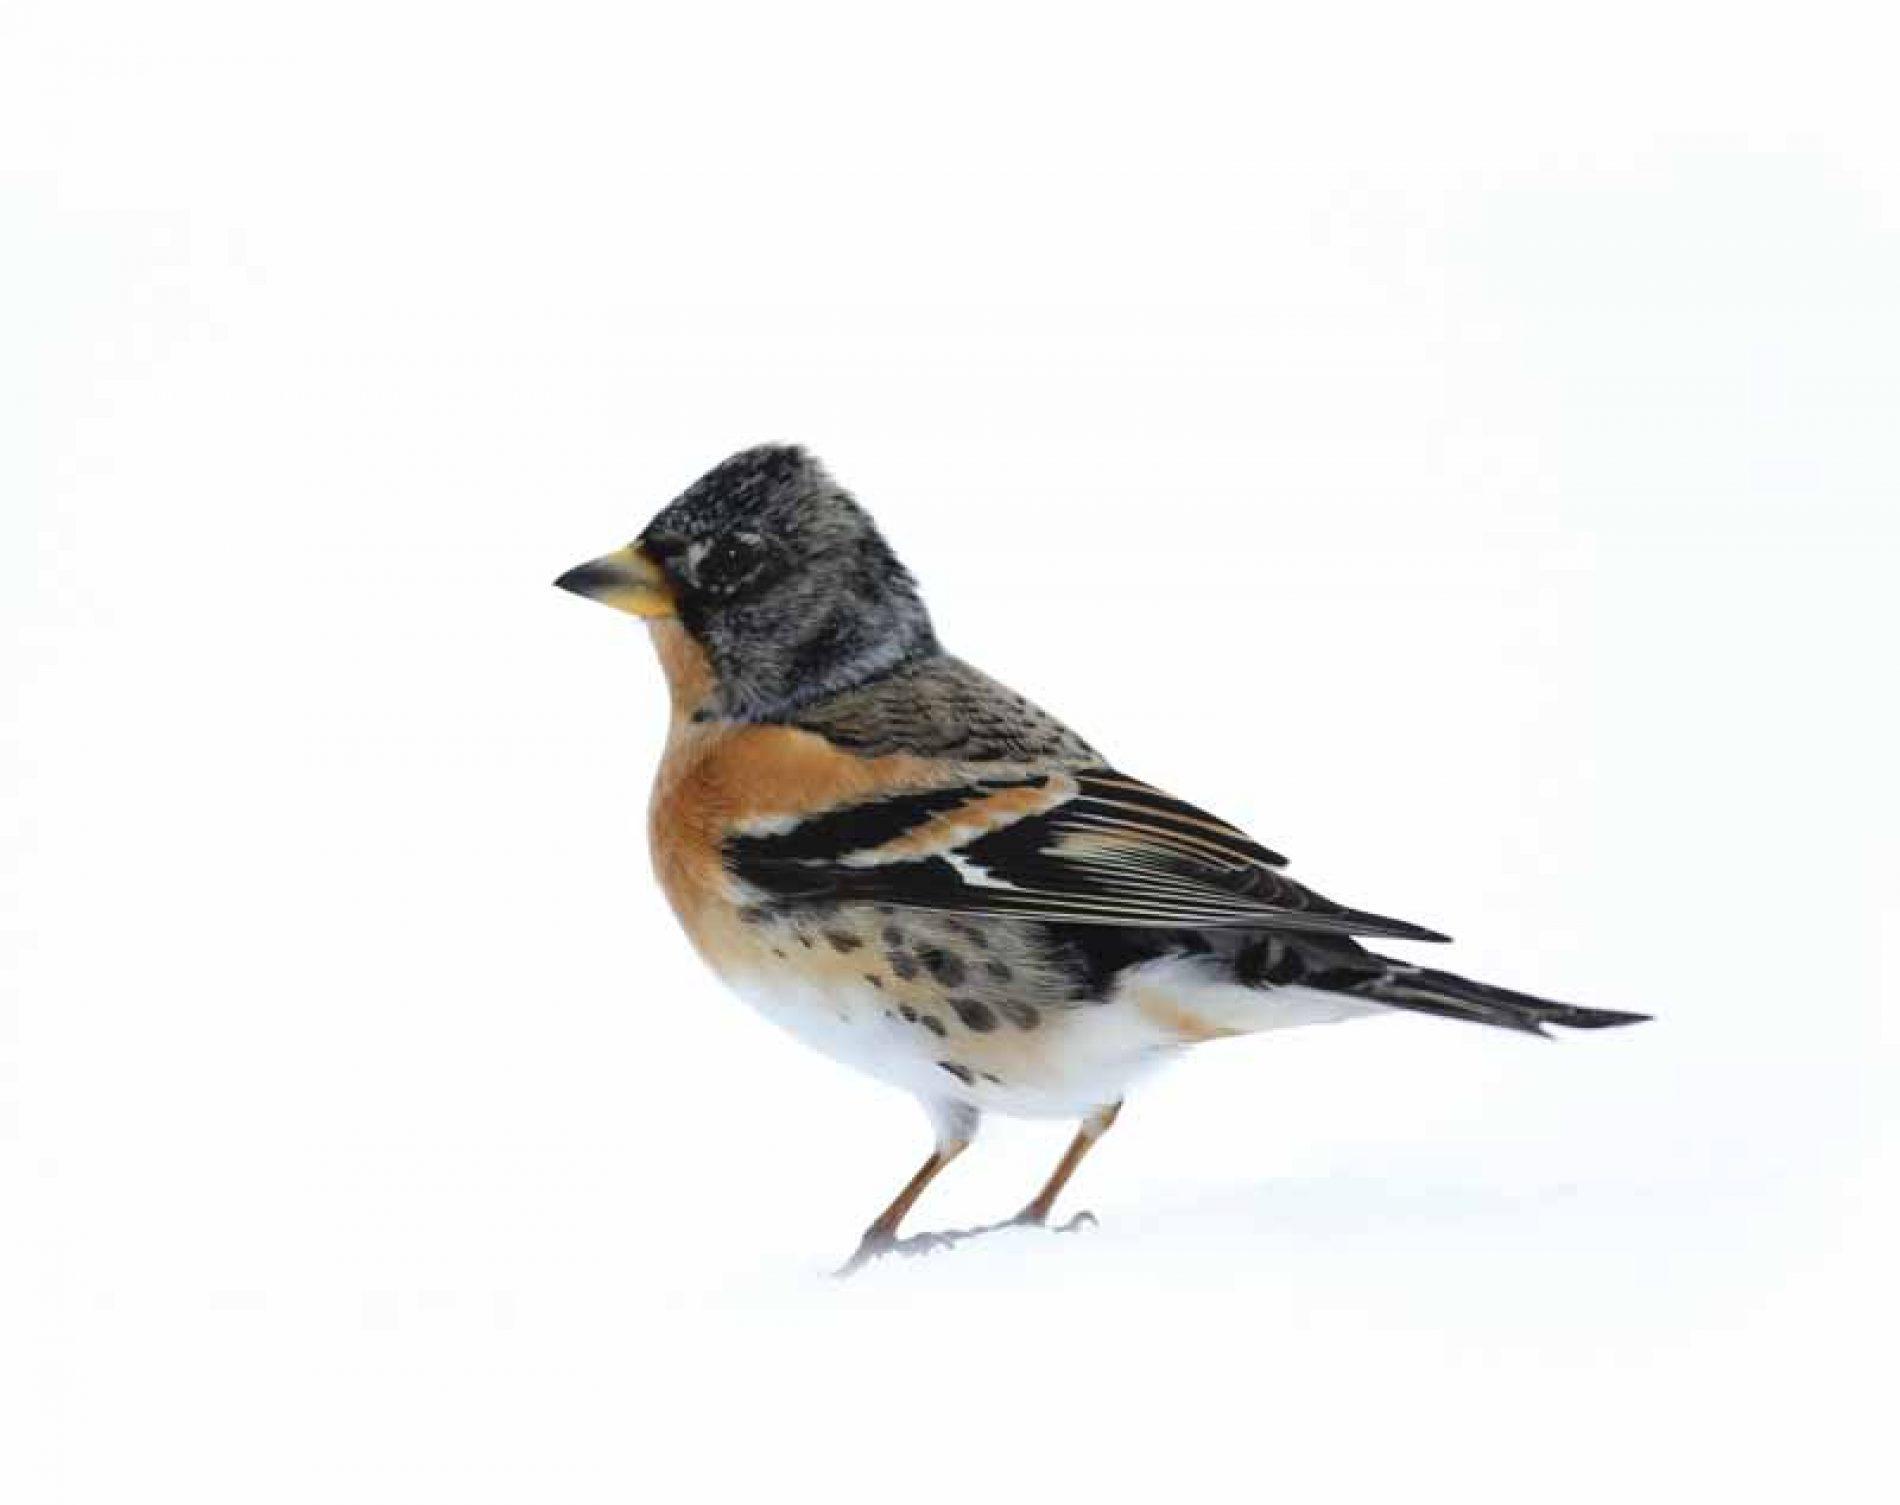 Silvestrismo, cazando aves con red y reclamo